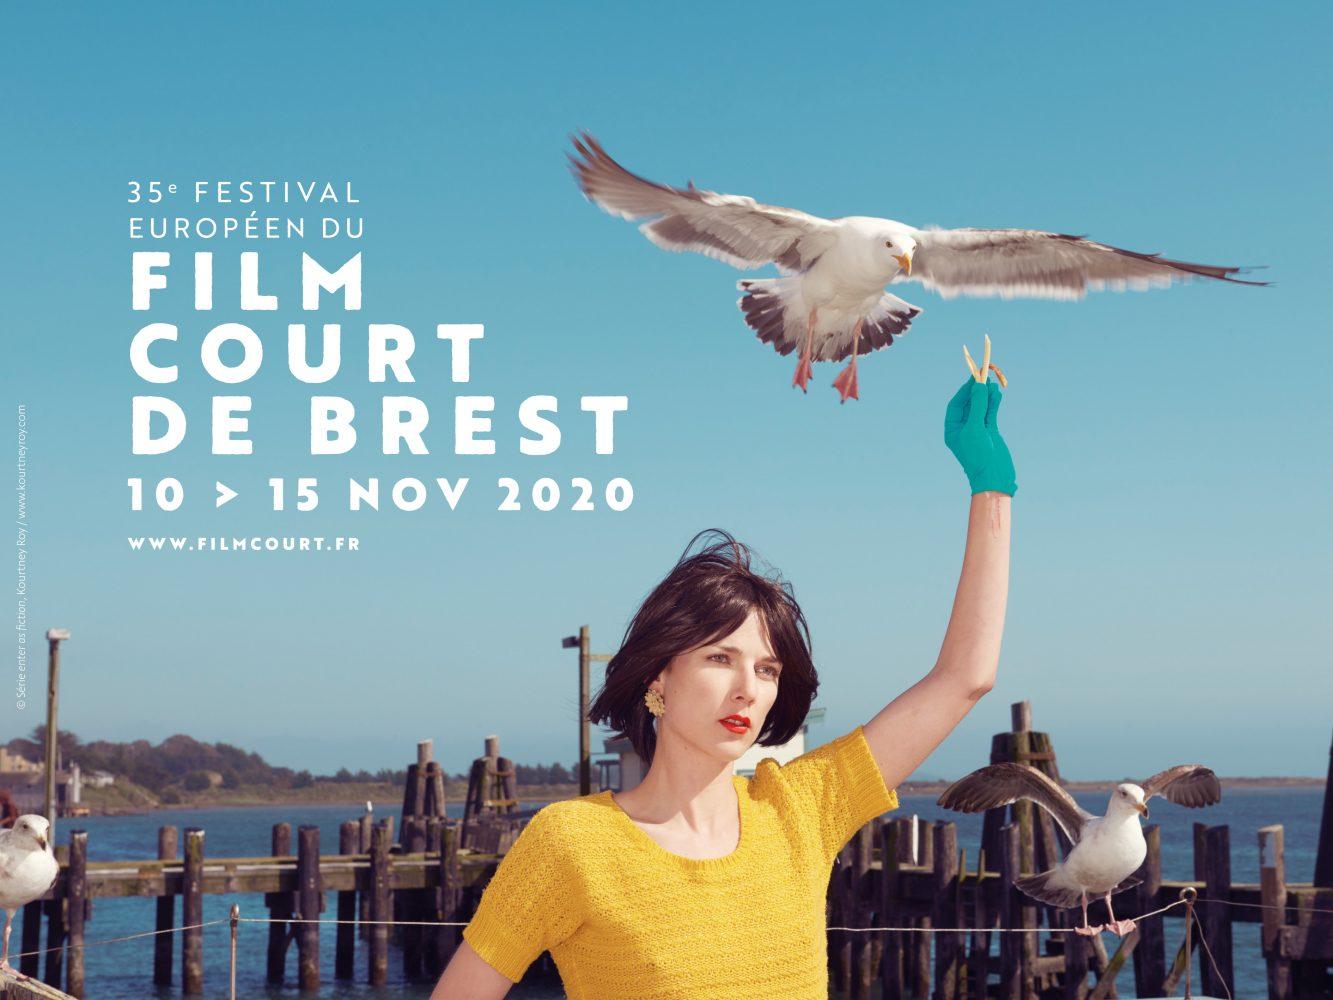 Film Court Brest